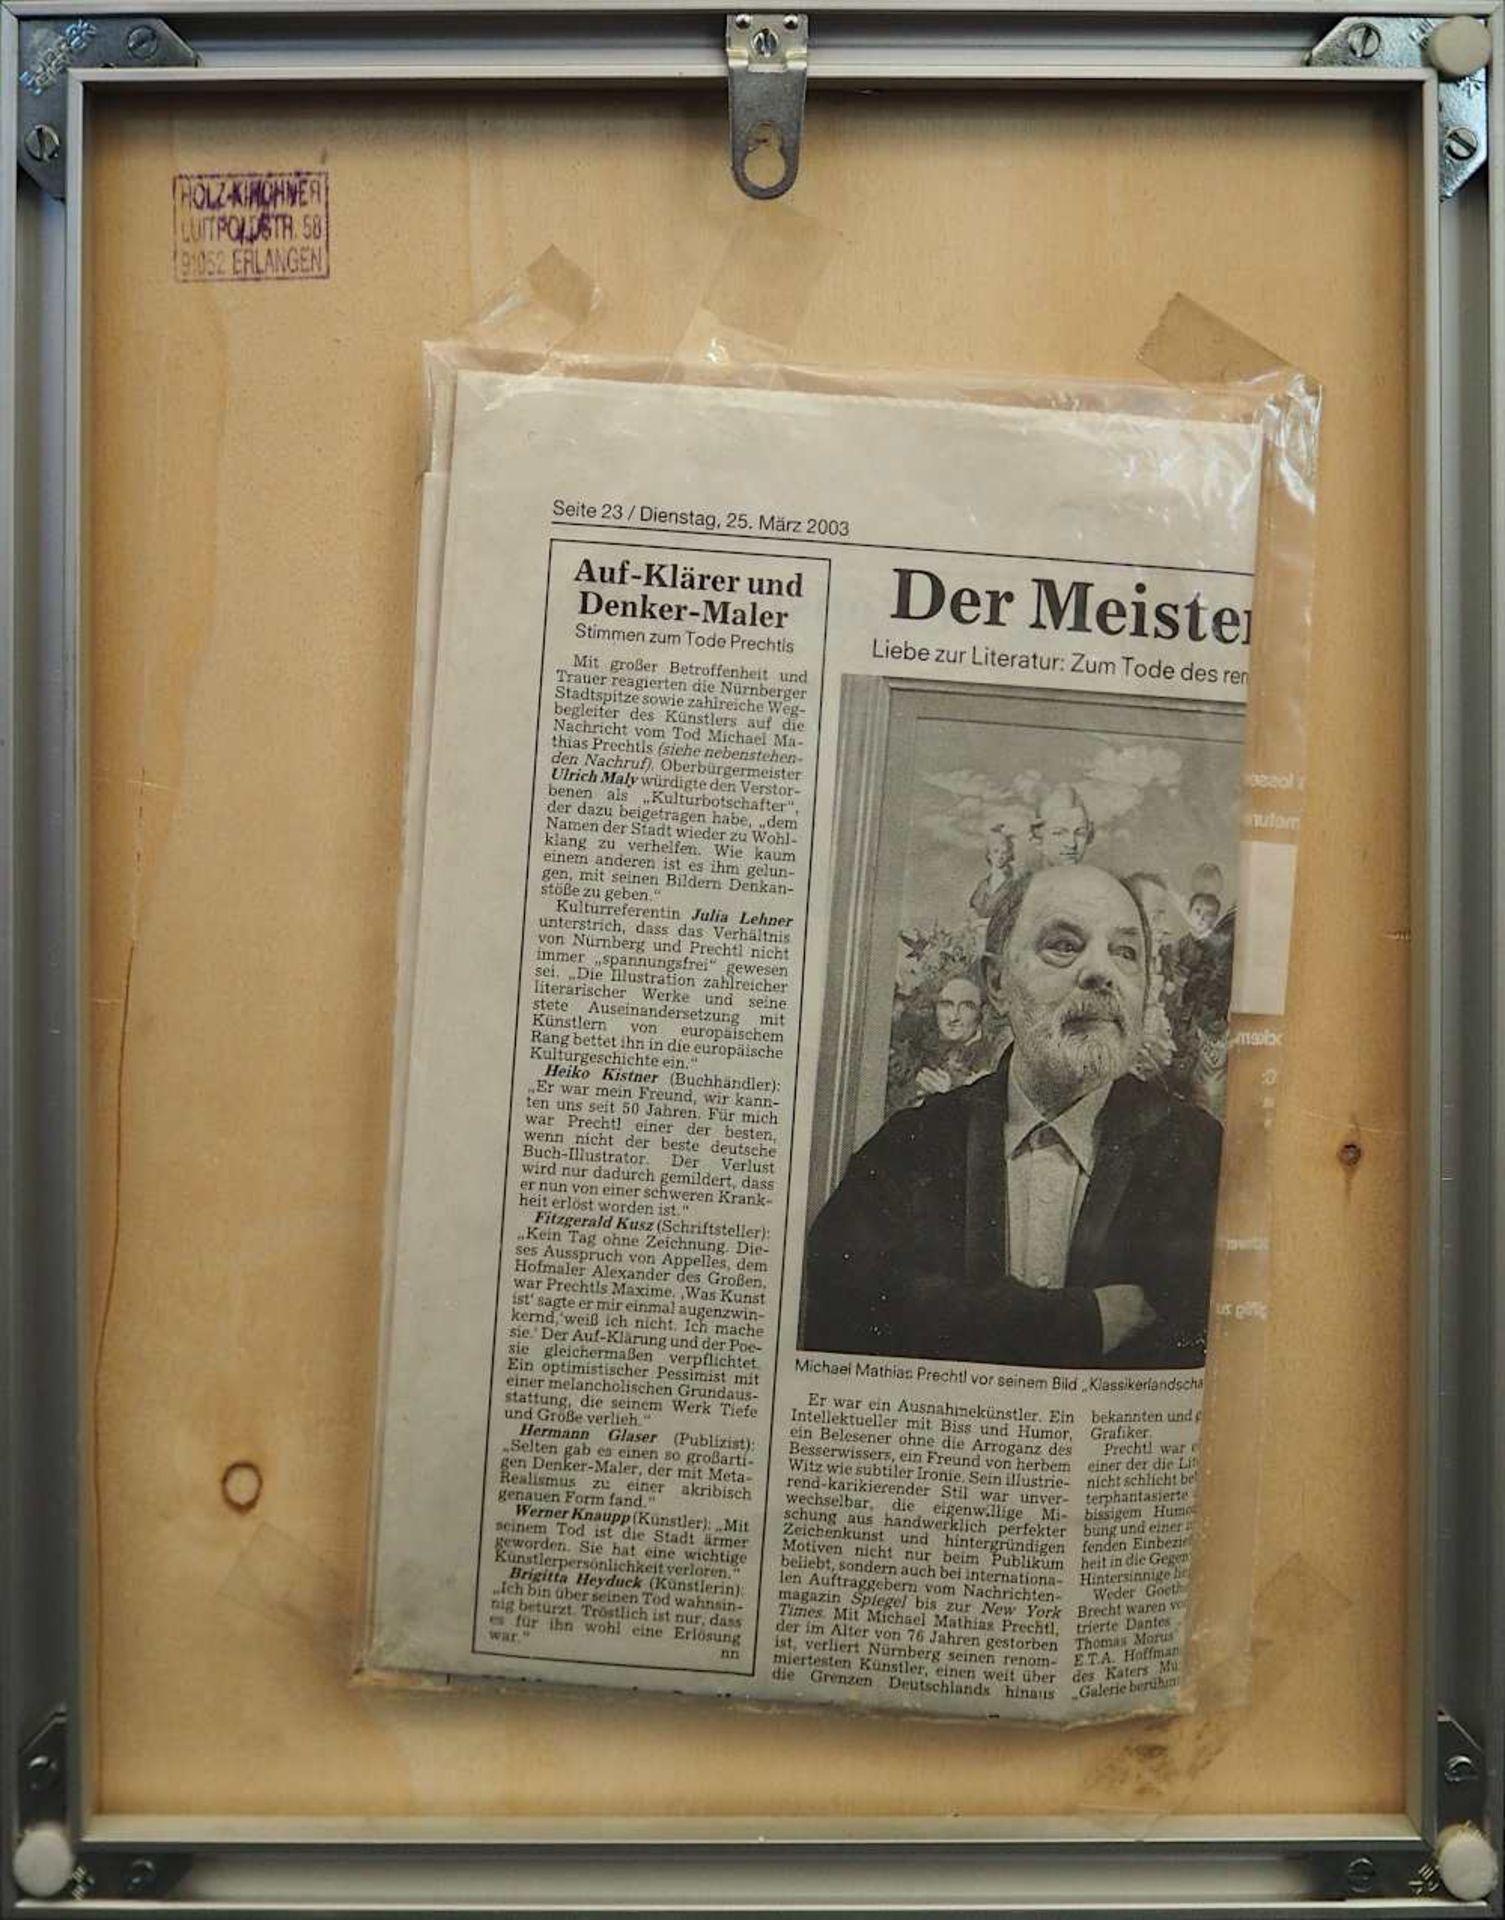 1 Farblithografie Mitte rechts bleistiftsign. M. M. PRECHTL (wohl Michael Mathias P. 1926-2003), - Bild 4 aus 4